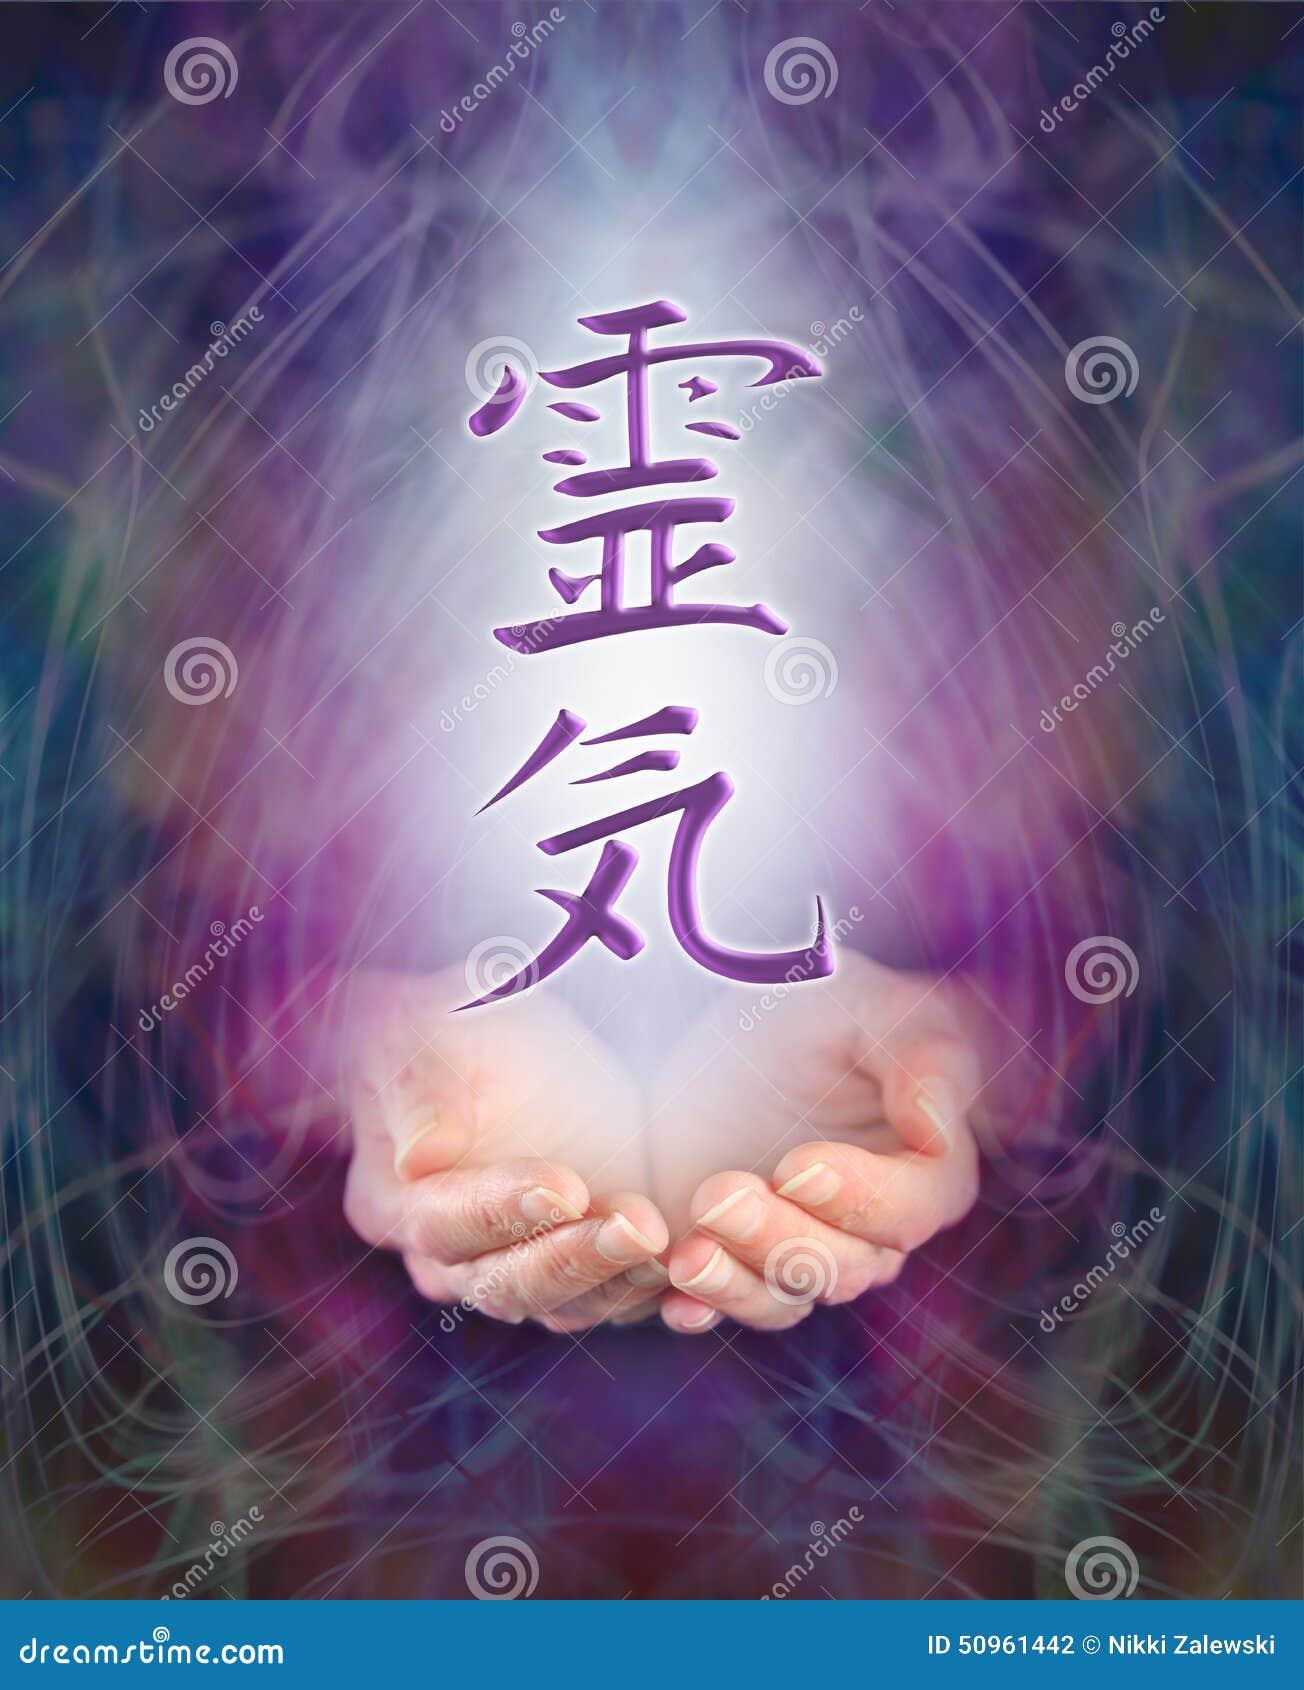 Sending Reiki Healing Energy Stock Photo Image 50961442